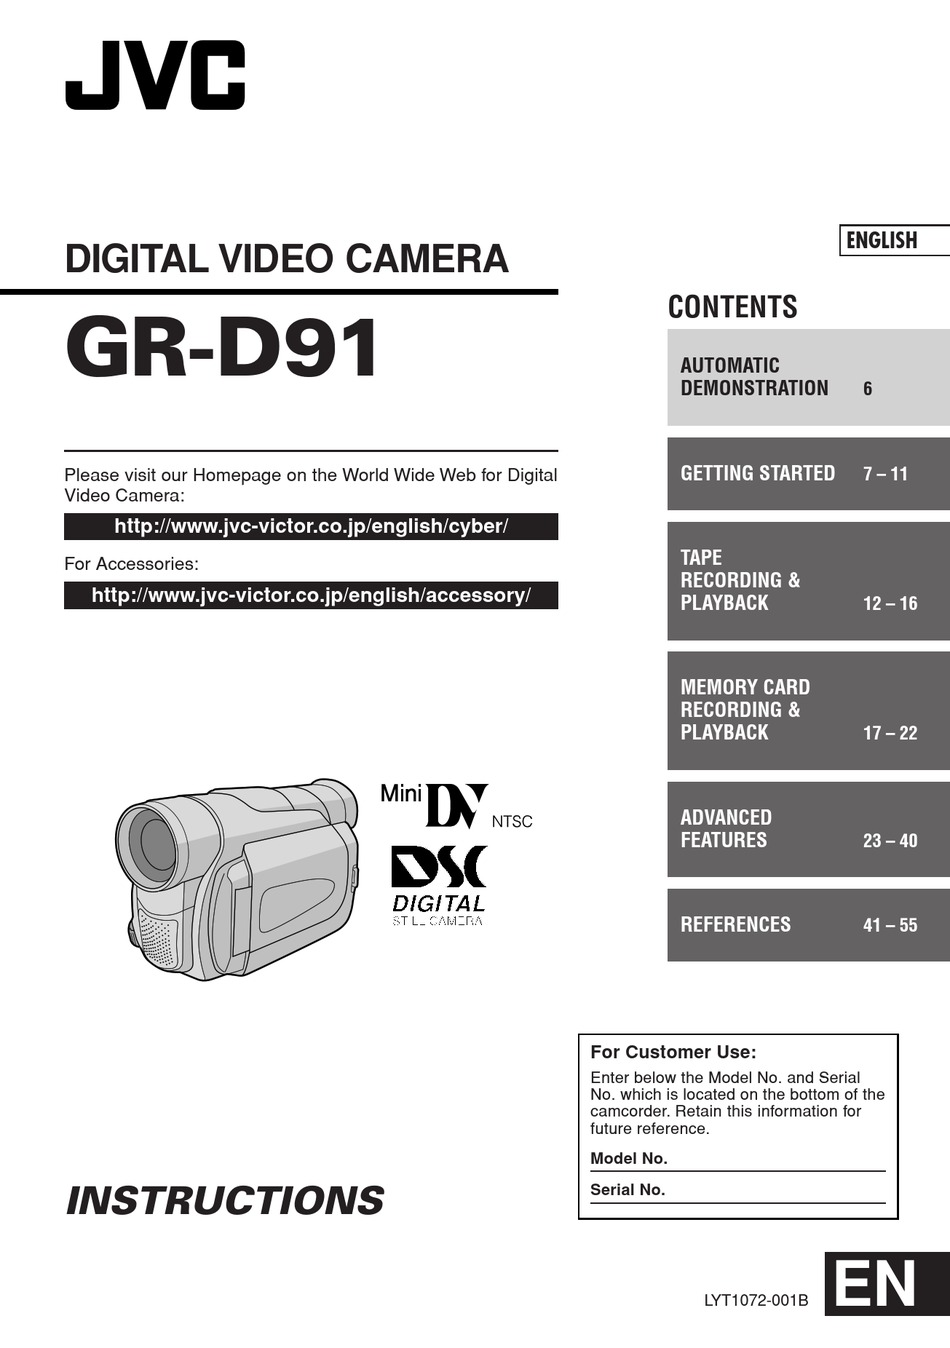 jvc digital video camera gr-d31ek manual